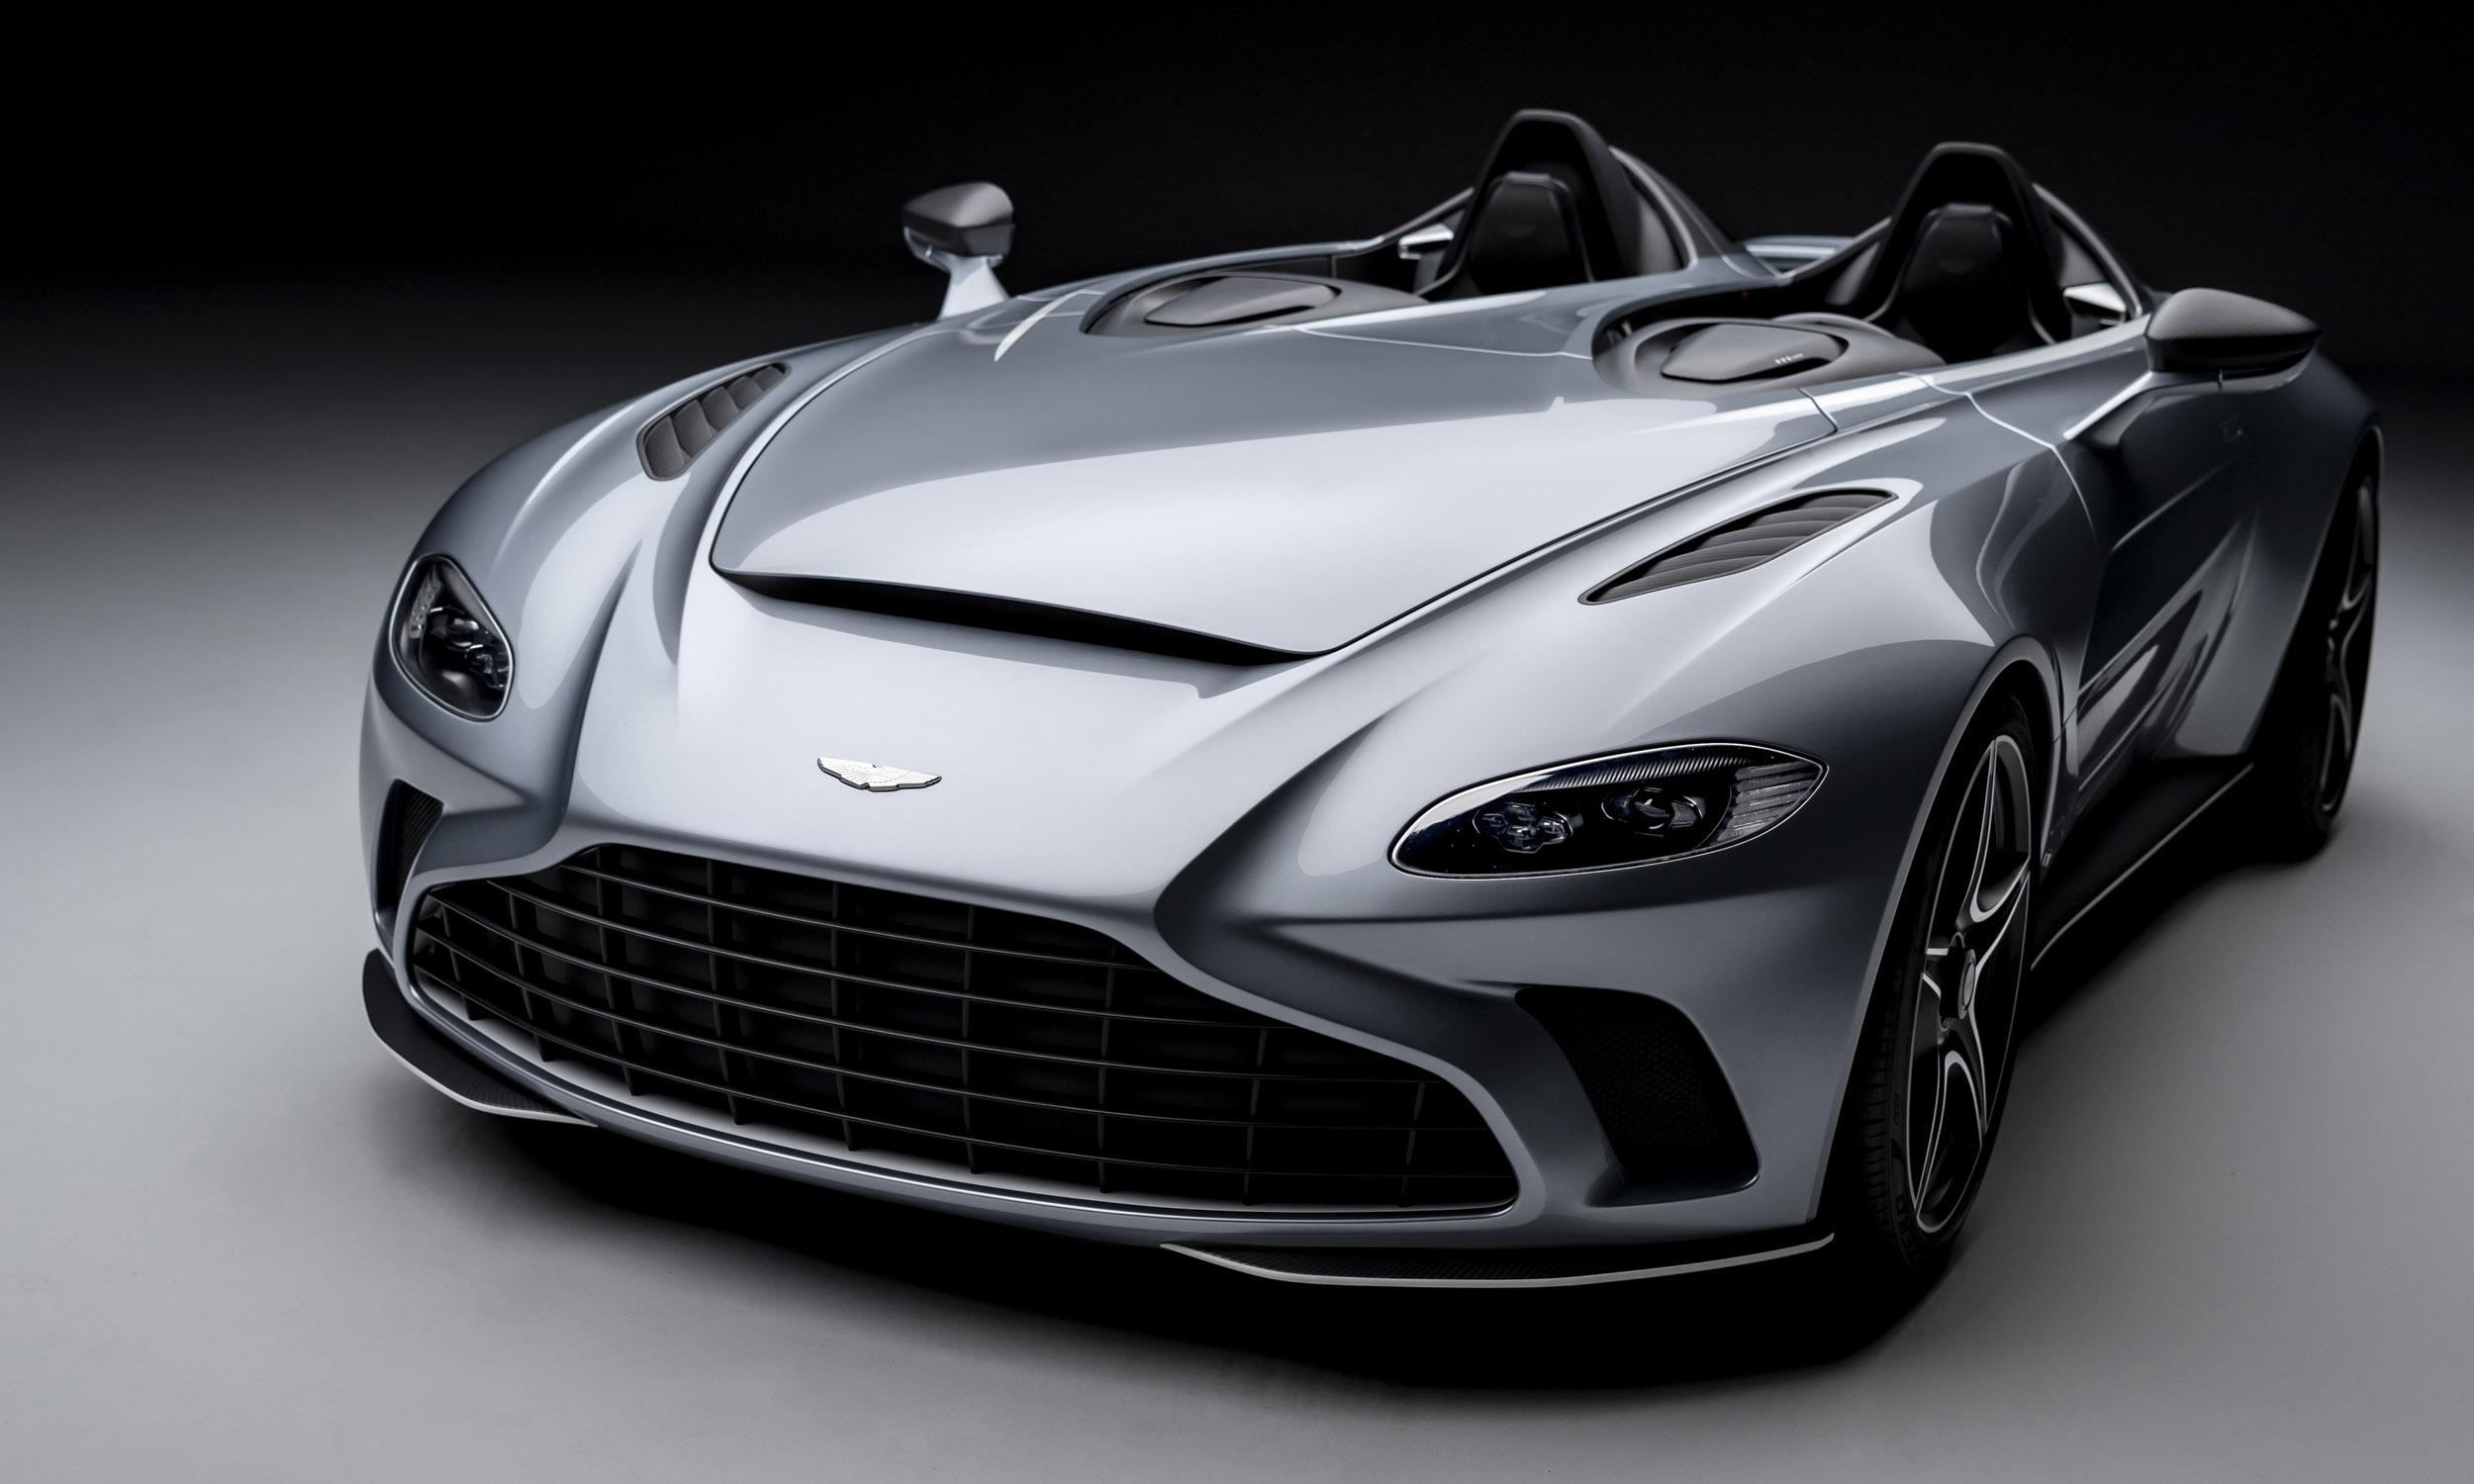 Aston Martin V12 Speedster: First Look